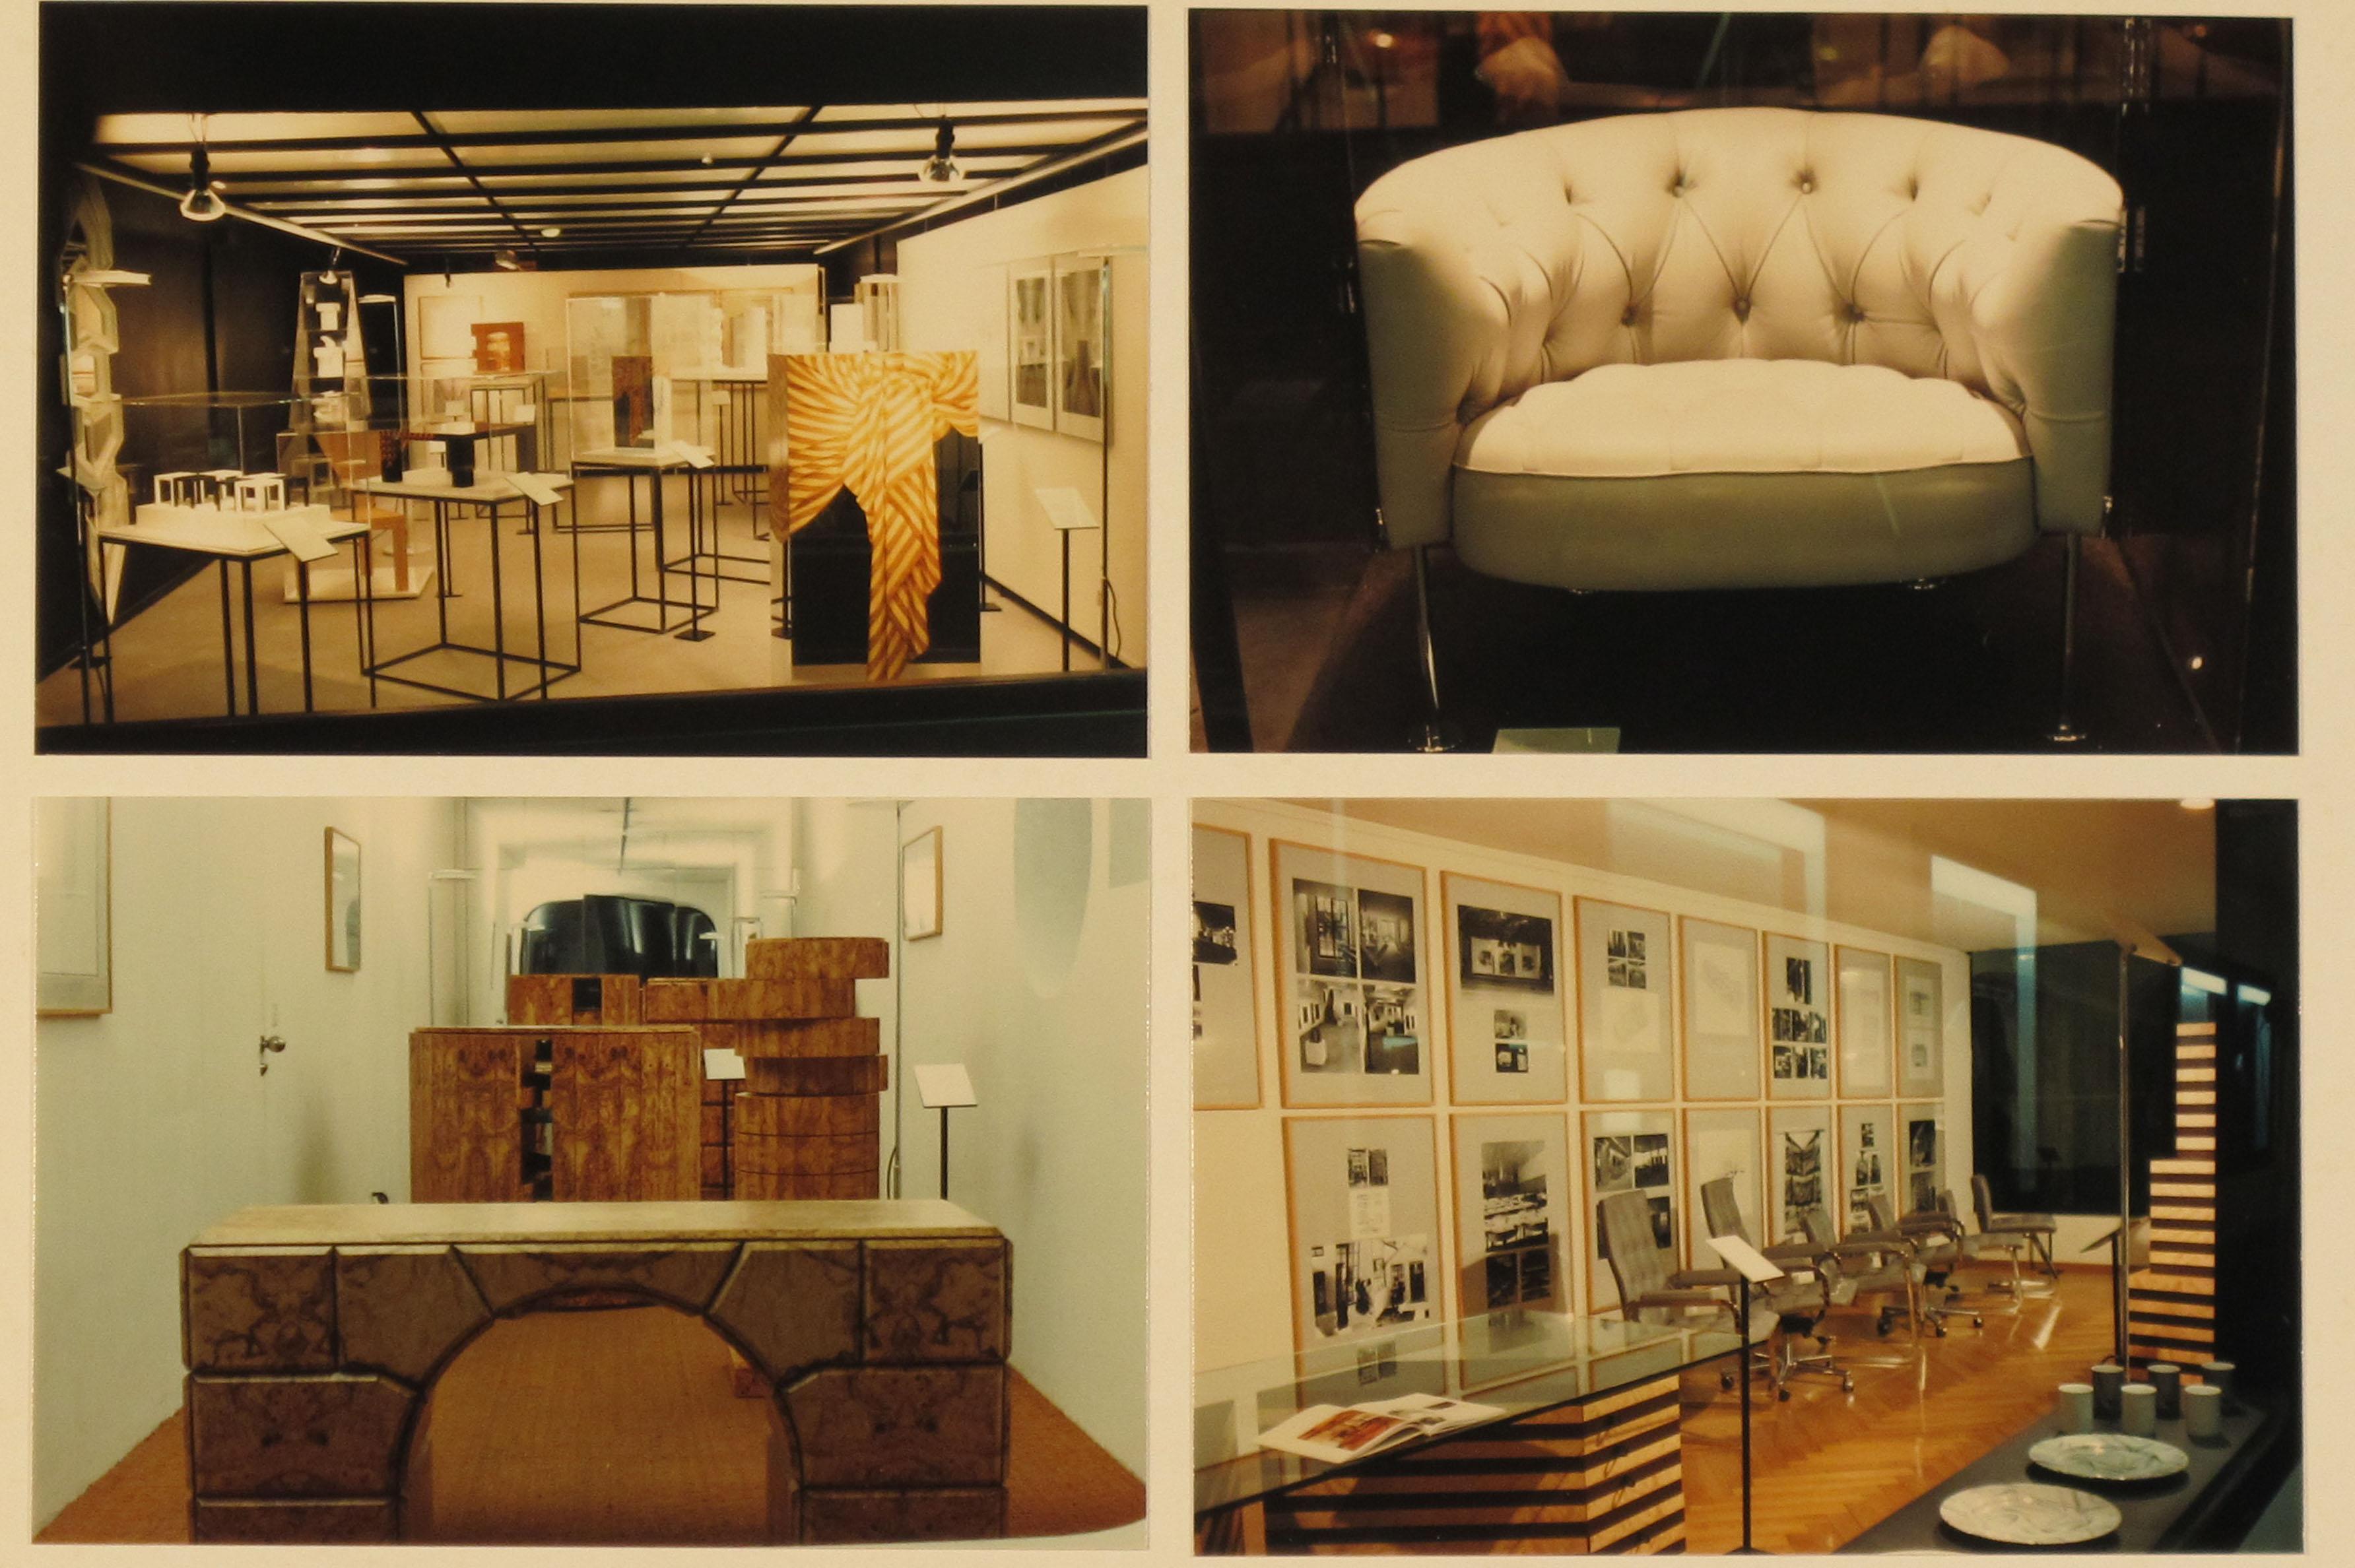 Ausstellungsansichten Im Möbelgeschäft Teo Jakob All Over